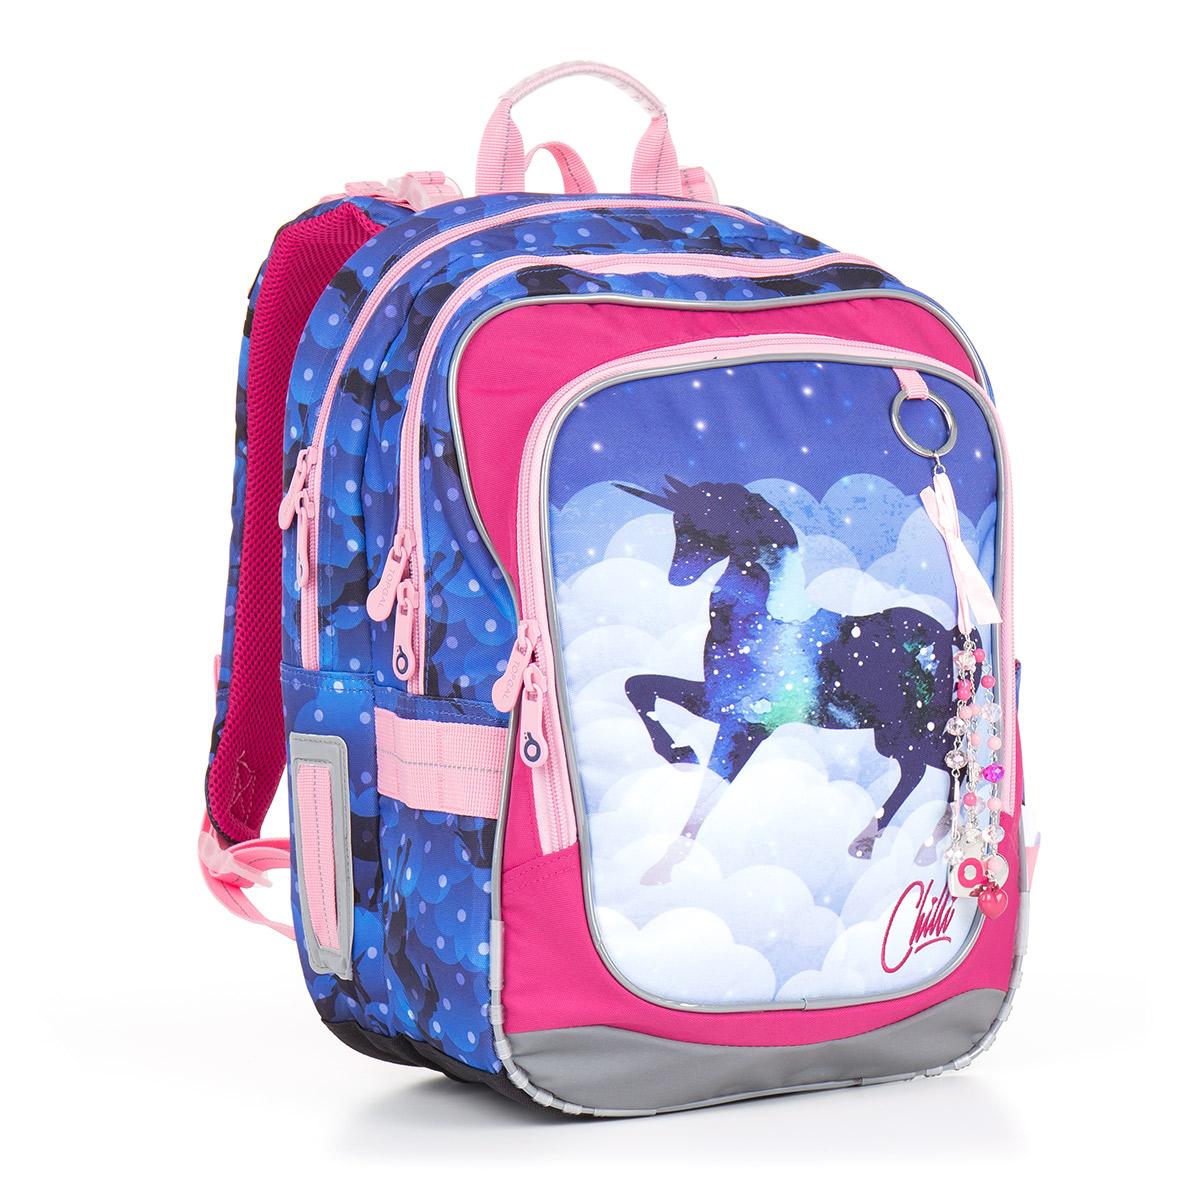 d4d123de469 Školní batoh Topgal - CHI 843